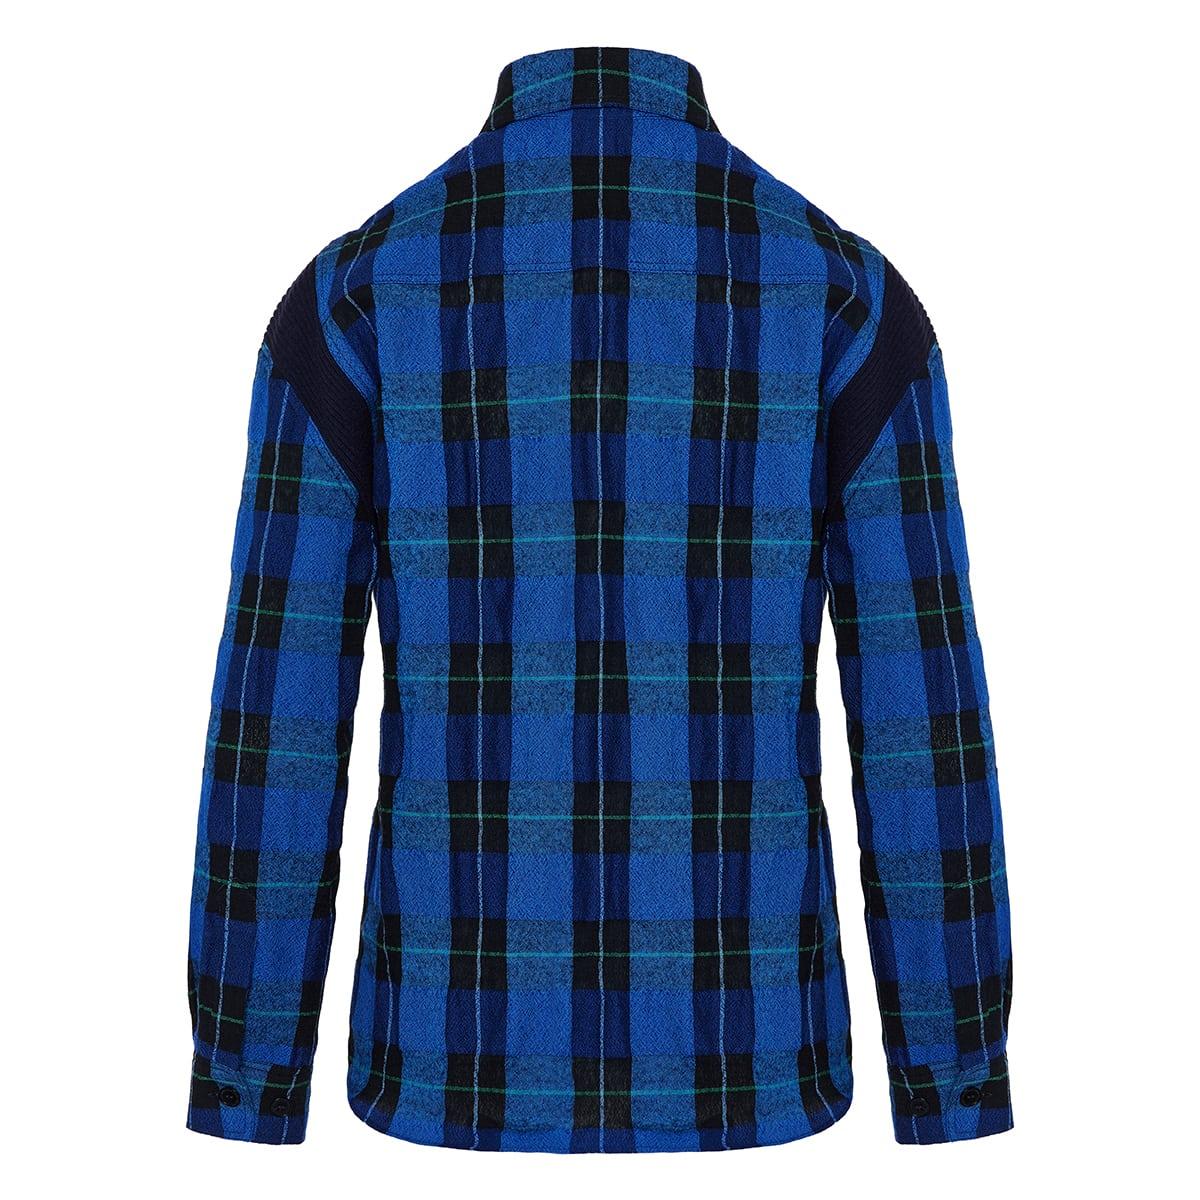 Gwen oversized checked shirt